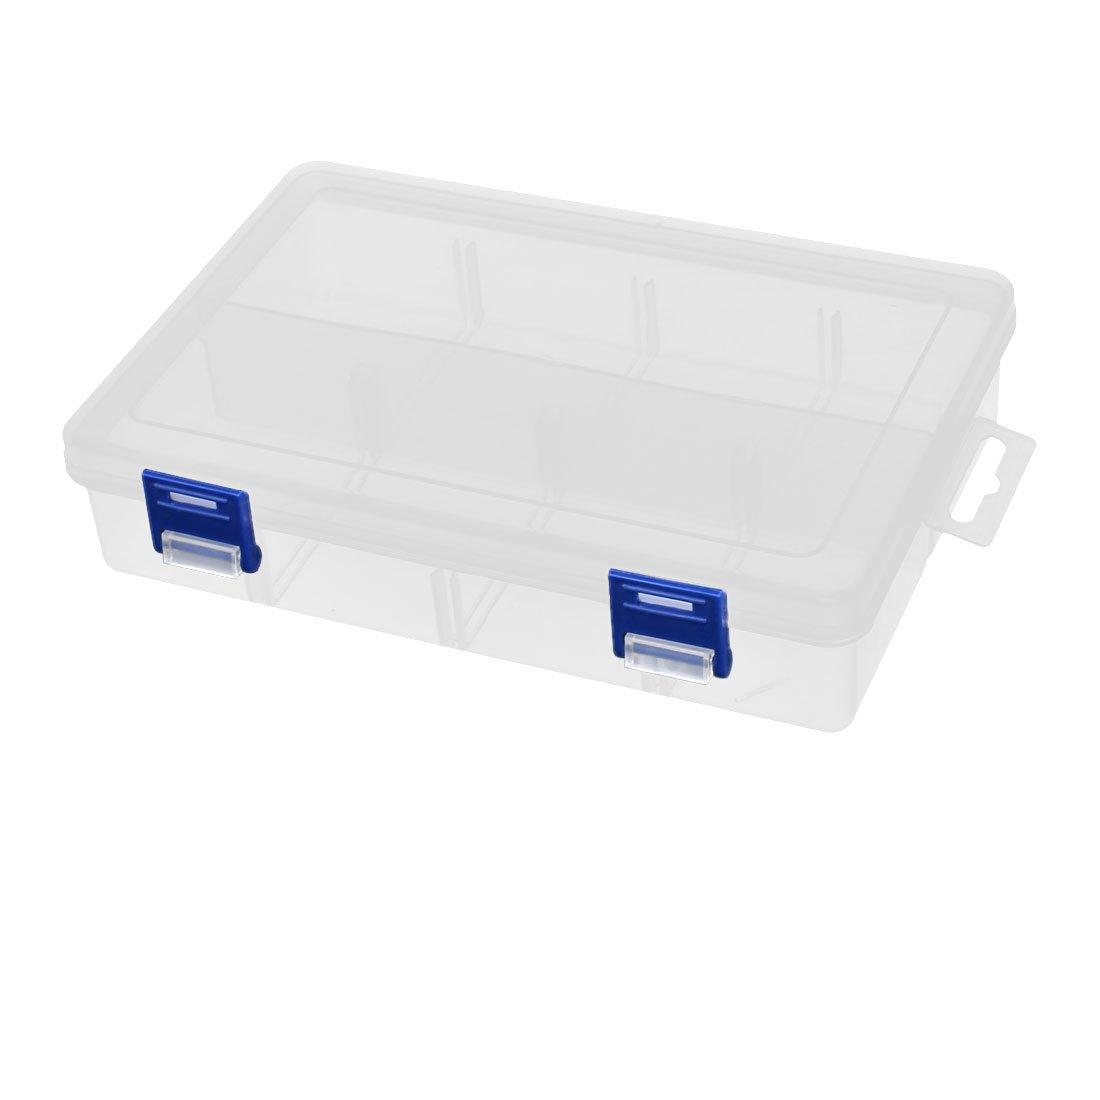 uxcell 200mmx140mmx45mm 8 Slots Component Storage Organizer Case DIY Tool Clear